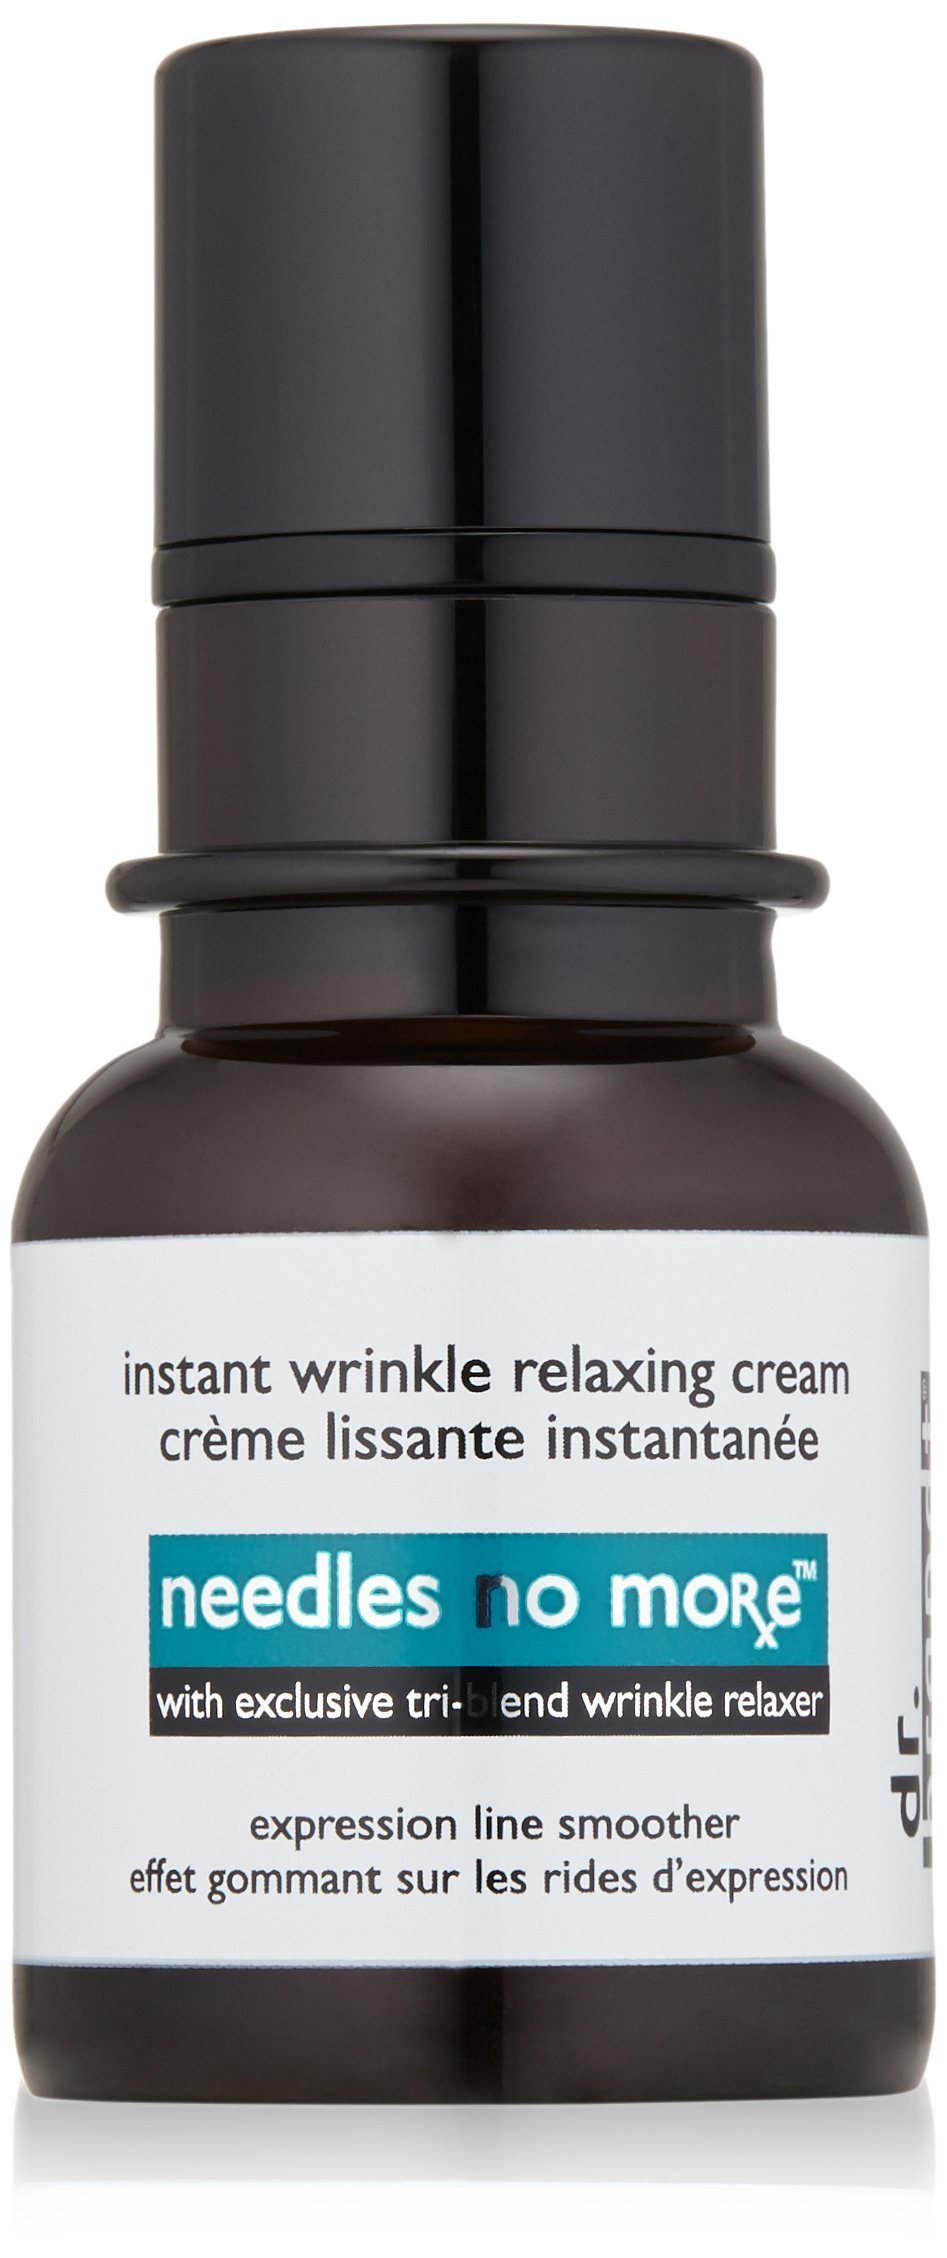 dr. brand needles no more wrinkle smoothing cream, 0.5 fl. oz. / 15 ml